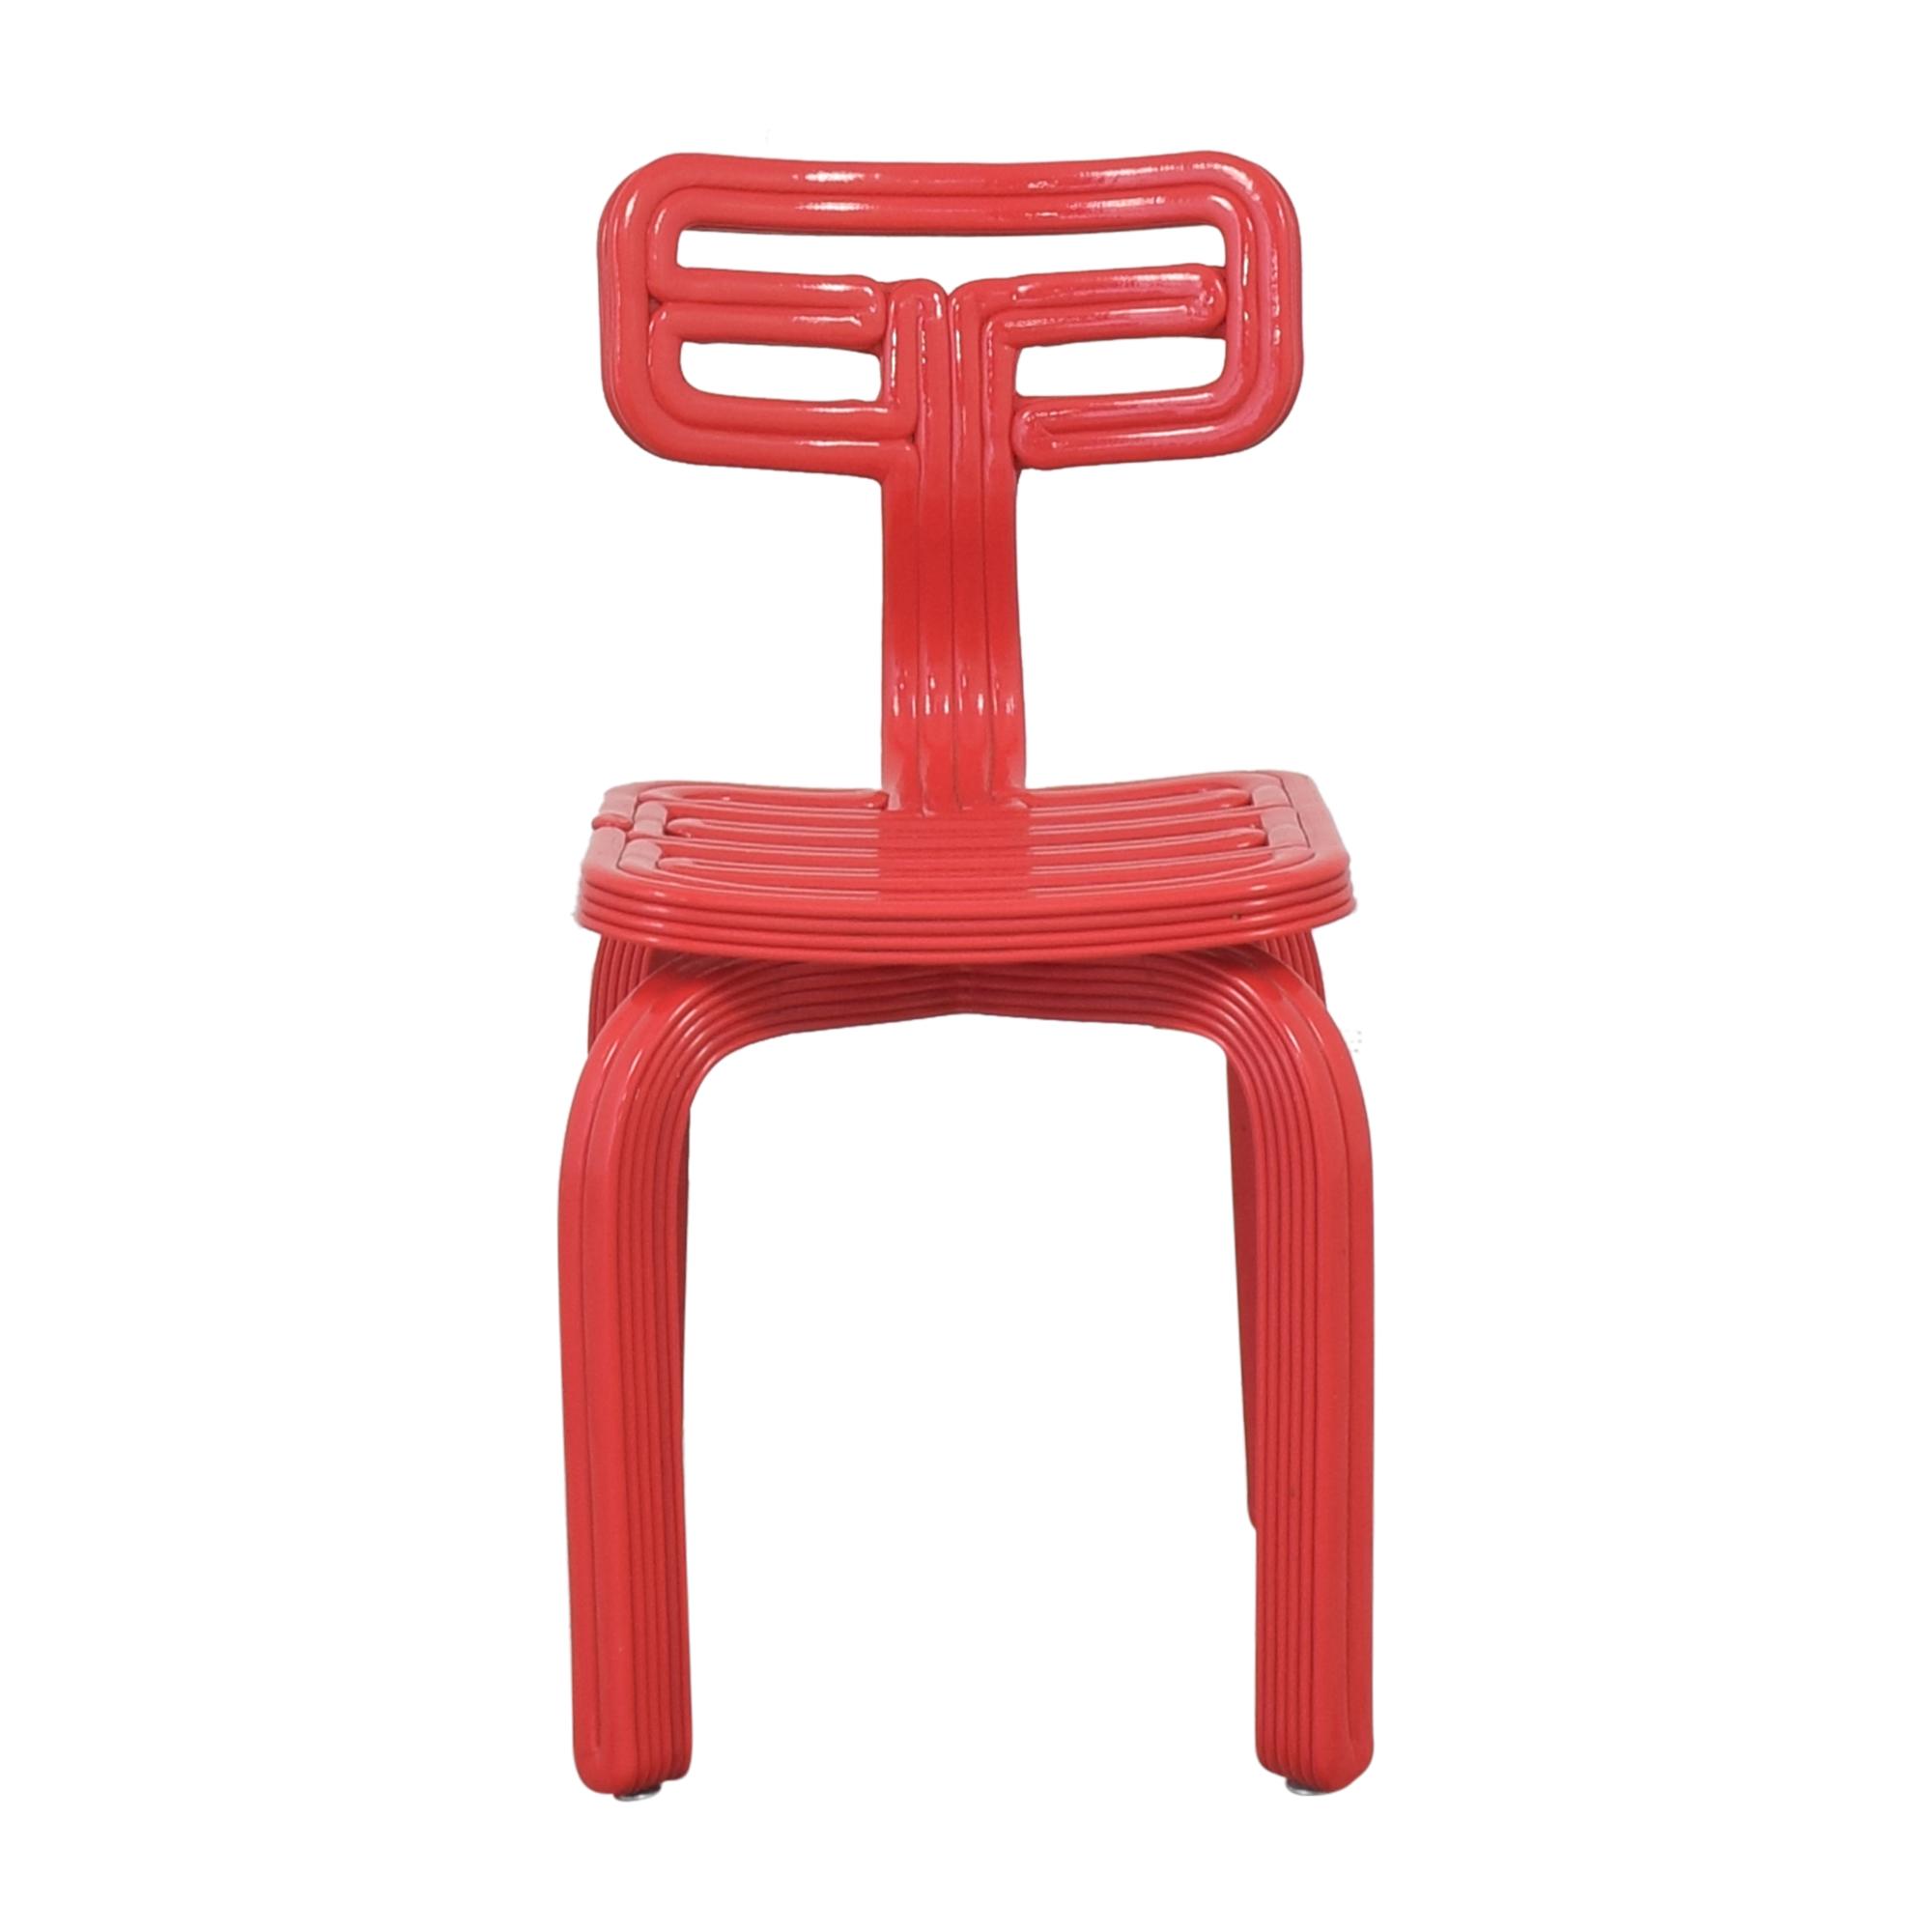 Dirk Vander Kooij Dirk Vander Kooij Chubby Chair ct